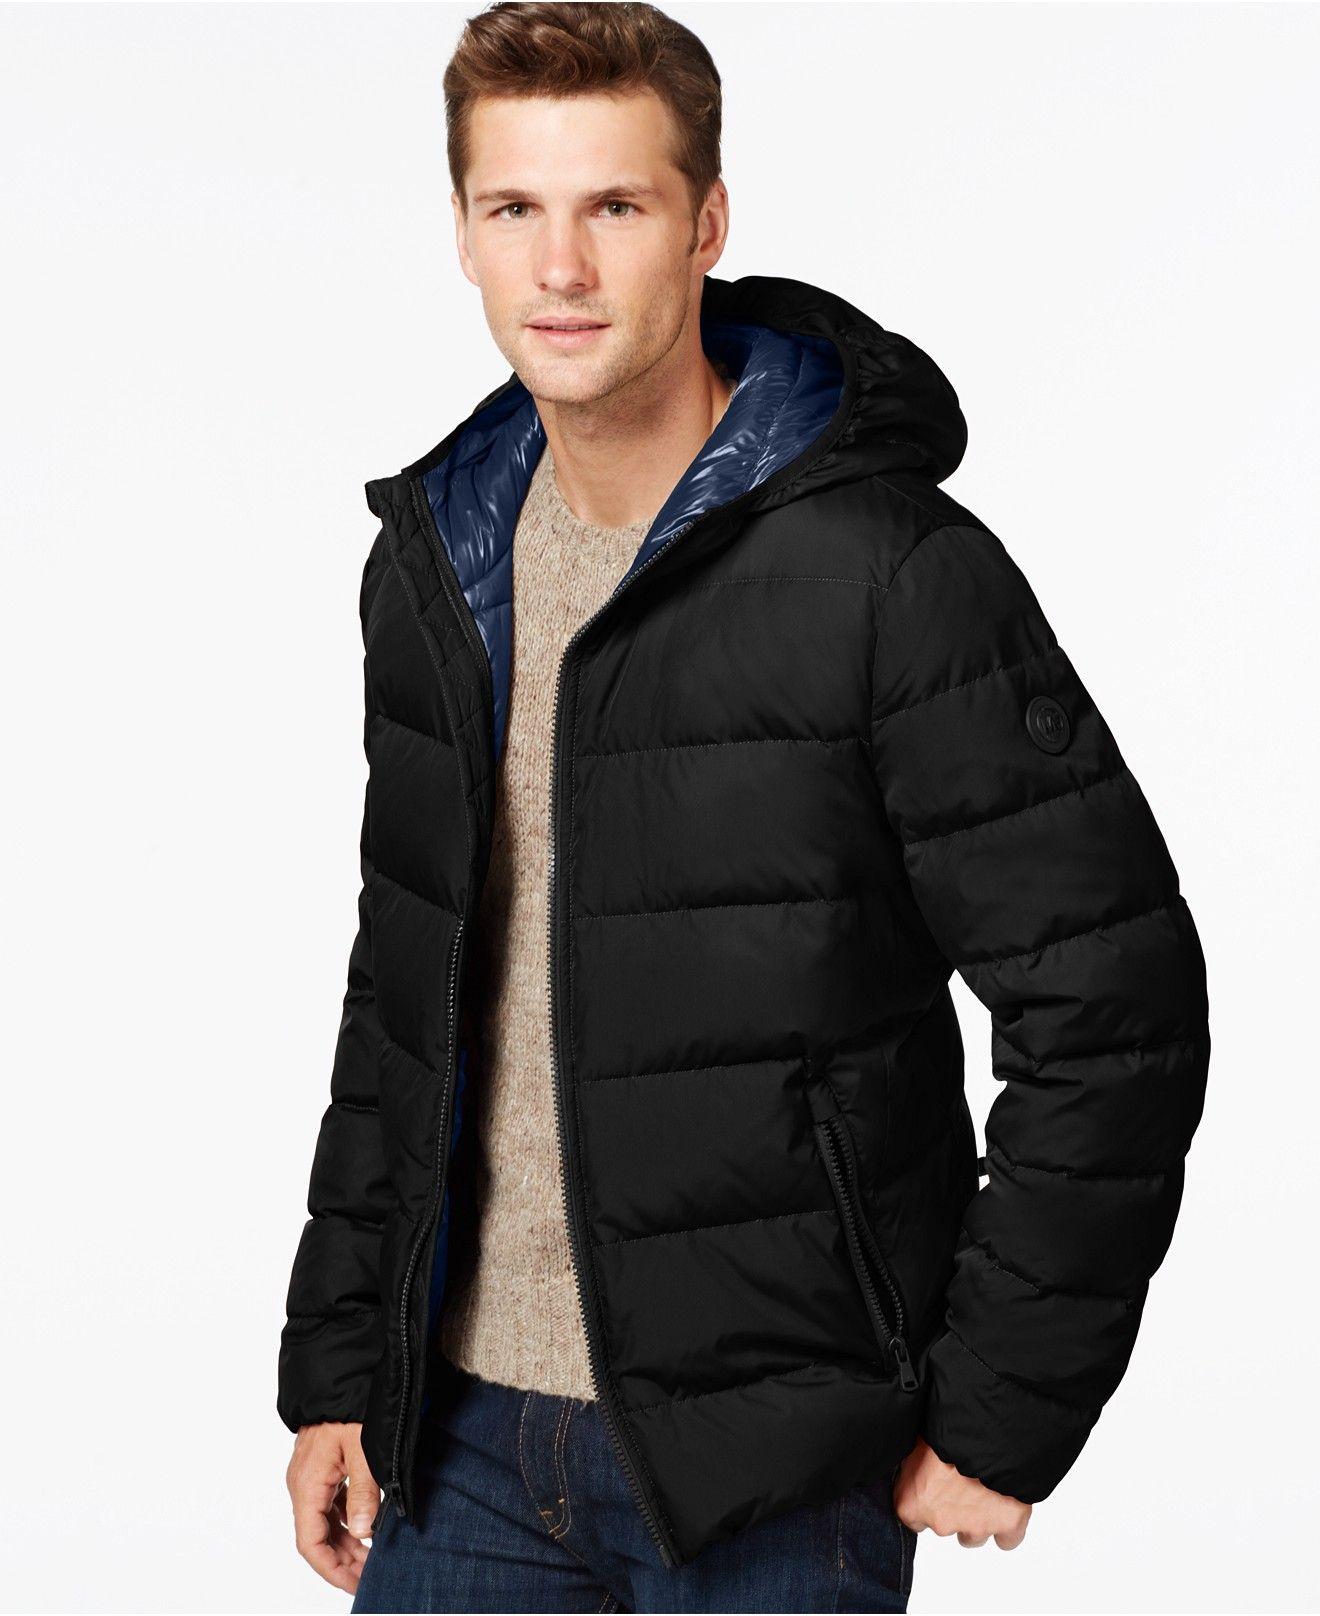 Michael Kors Michael Kors Men S Down Puffer Jacket Created For Macy S Reviews Coats Jackets Men Macy S Moda De Invierno Ropa De Moda Michael Kors